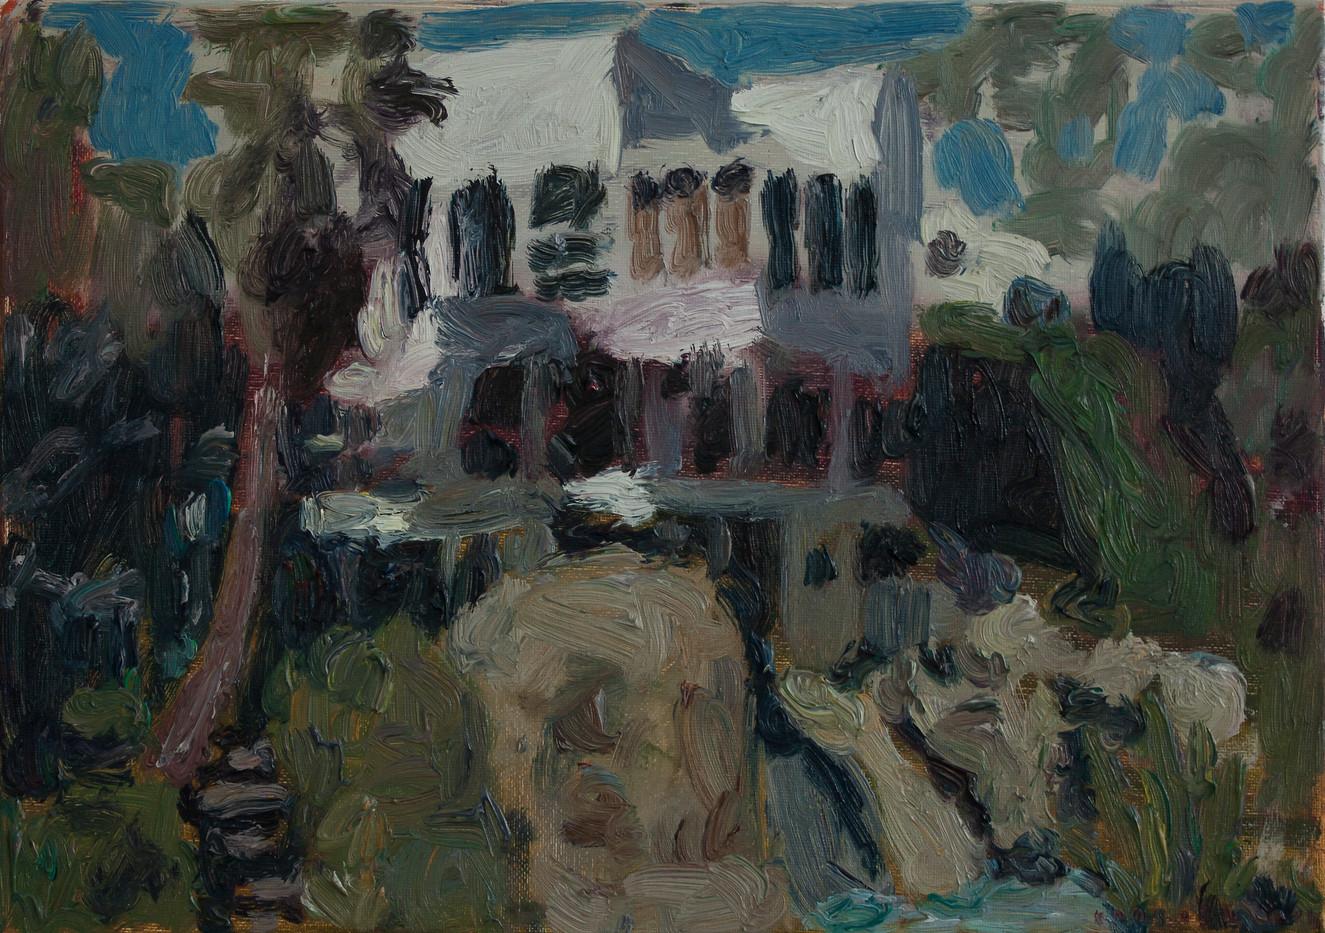 Anton Karstel | Property (Bantry Bay) | 2014 | Oil on Canvas | 29.5 x 42 cm